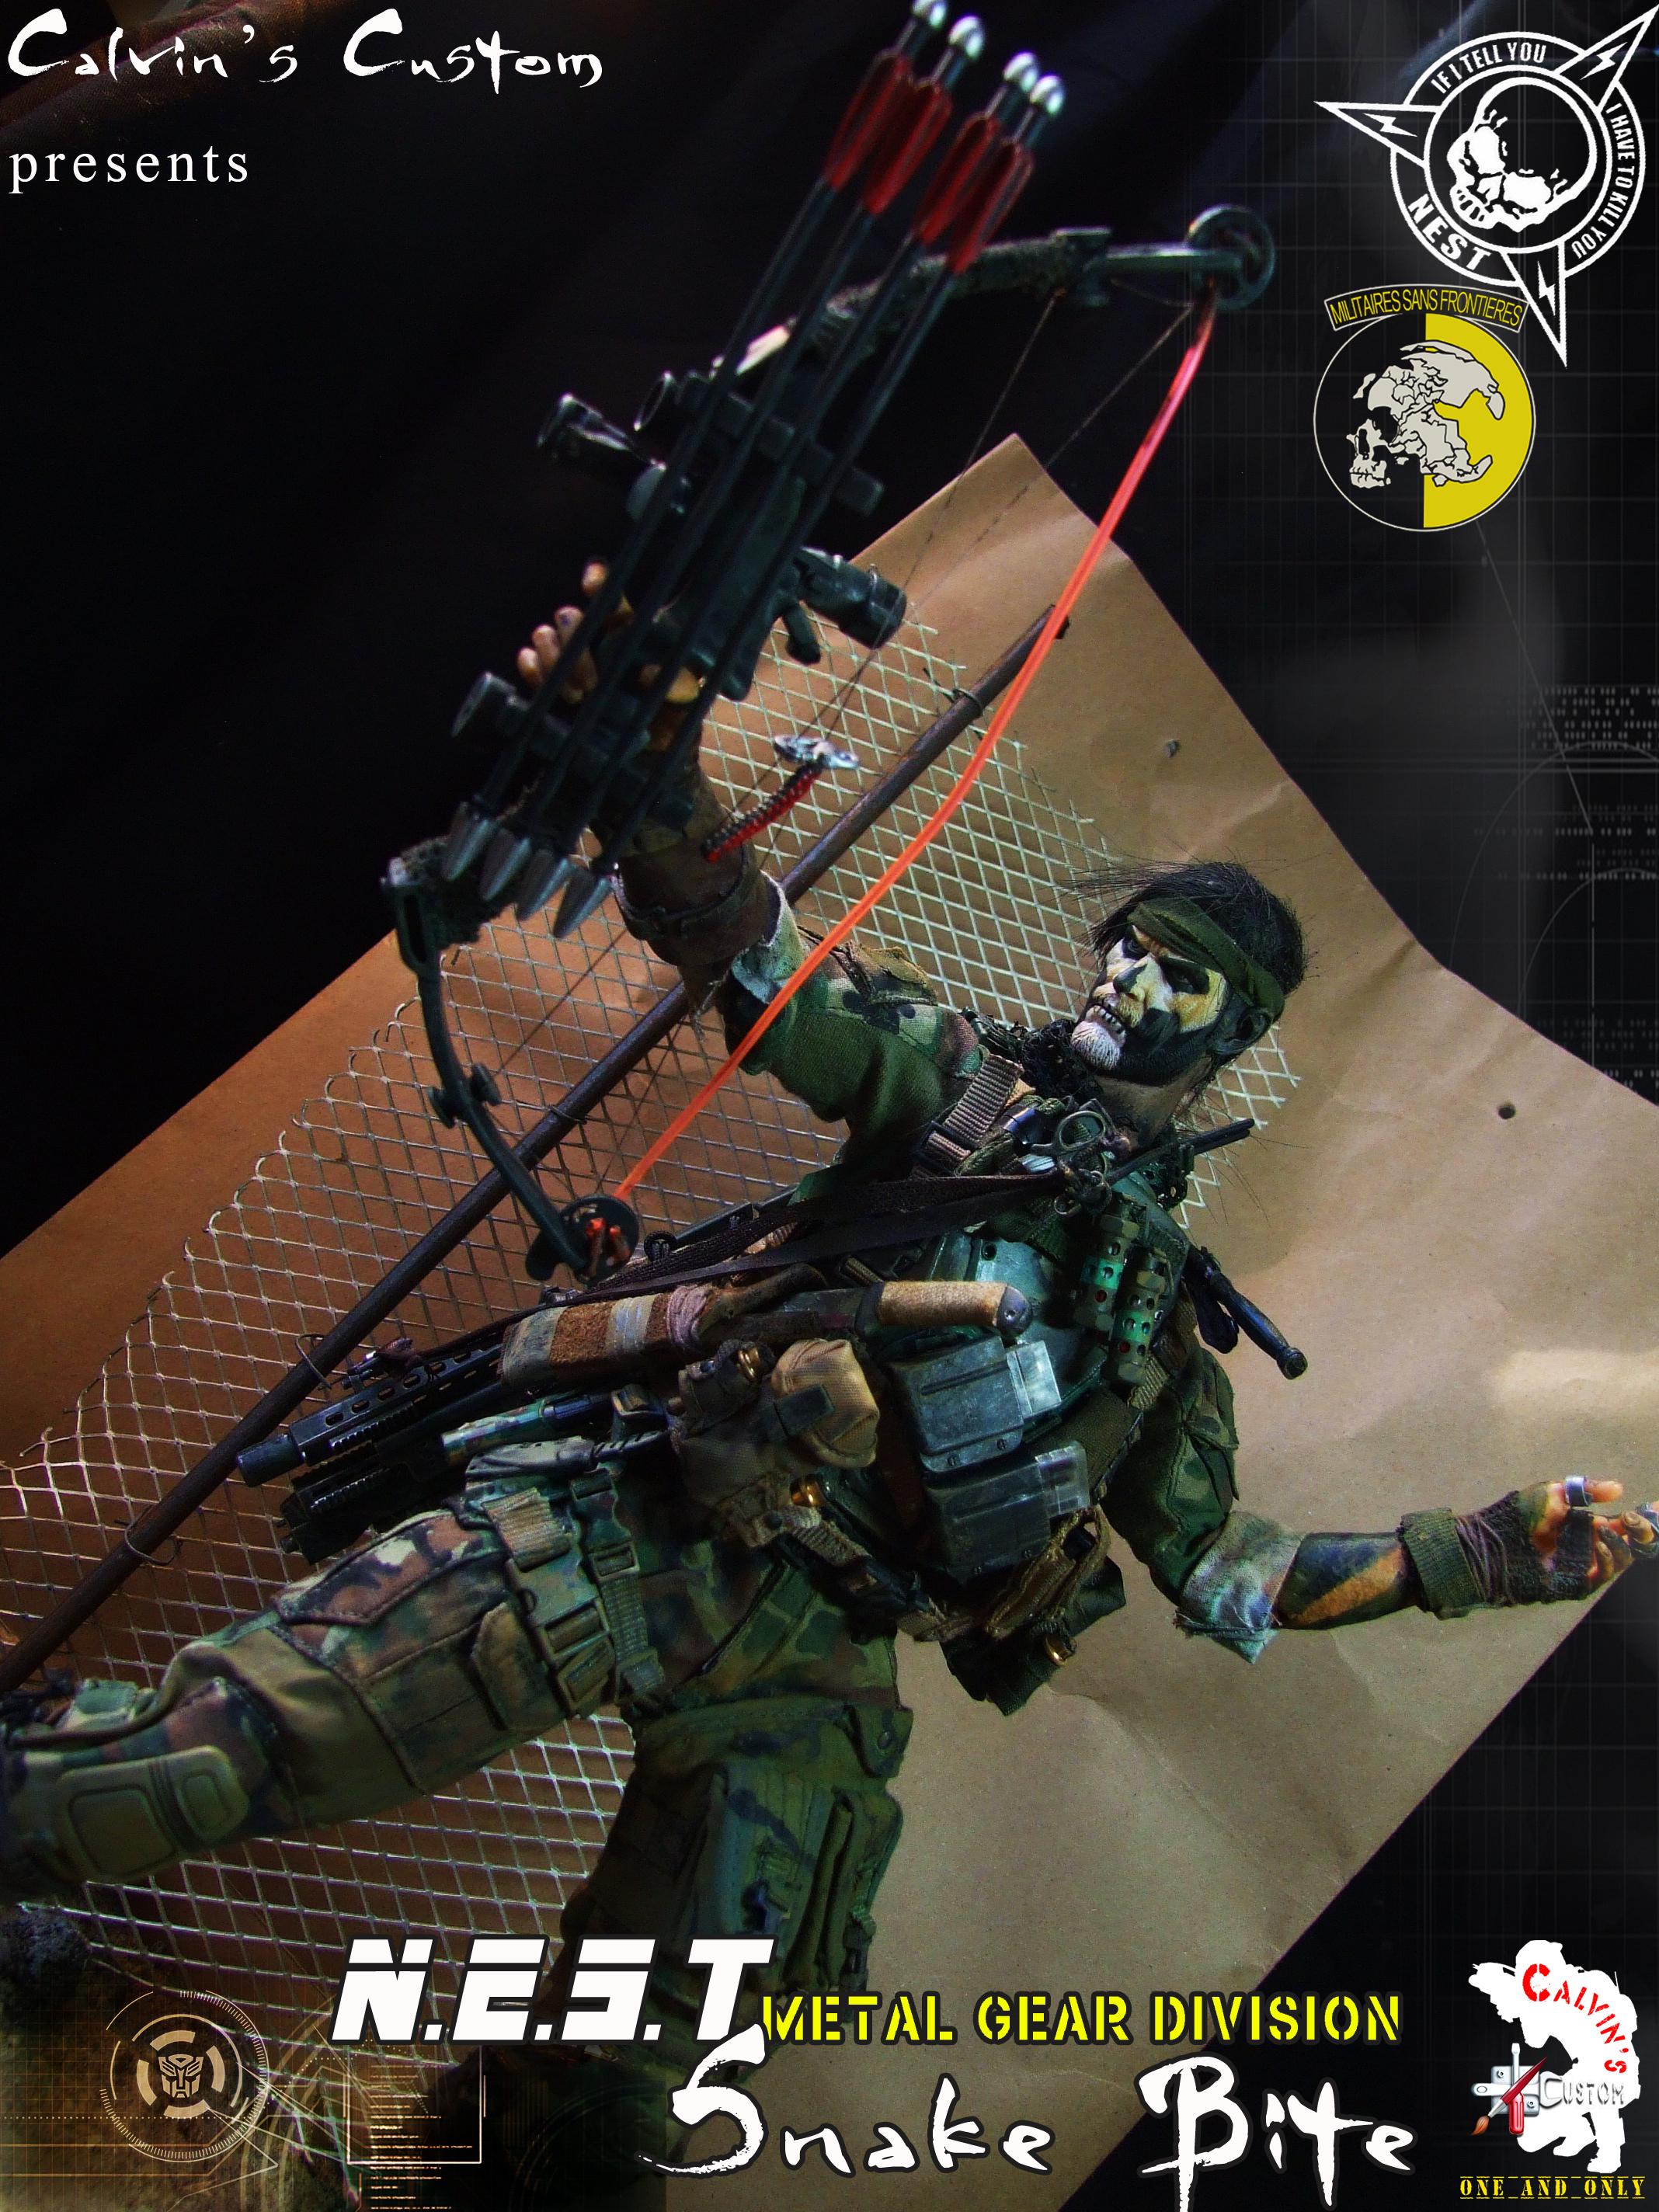 Metal Gear Solid - Solid & Liquid Snake - Metal Gear Solid